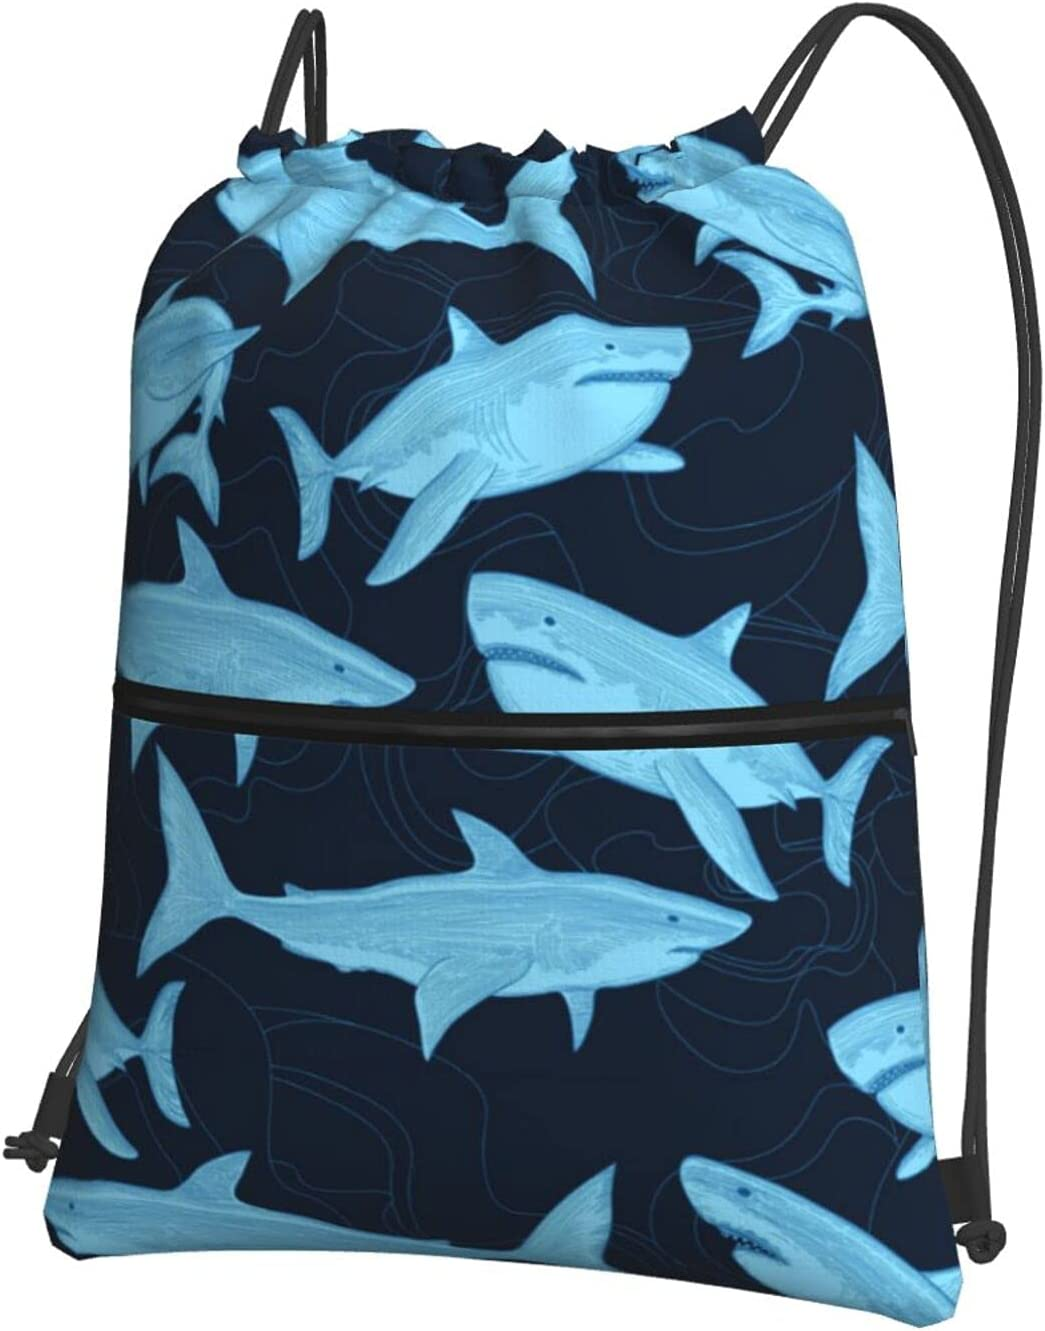 Reindeer Horn Blue Fierce Luxury goods Shark Drawstring Backpack High quality new Sports B Gym